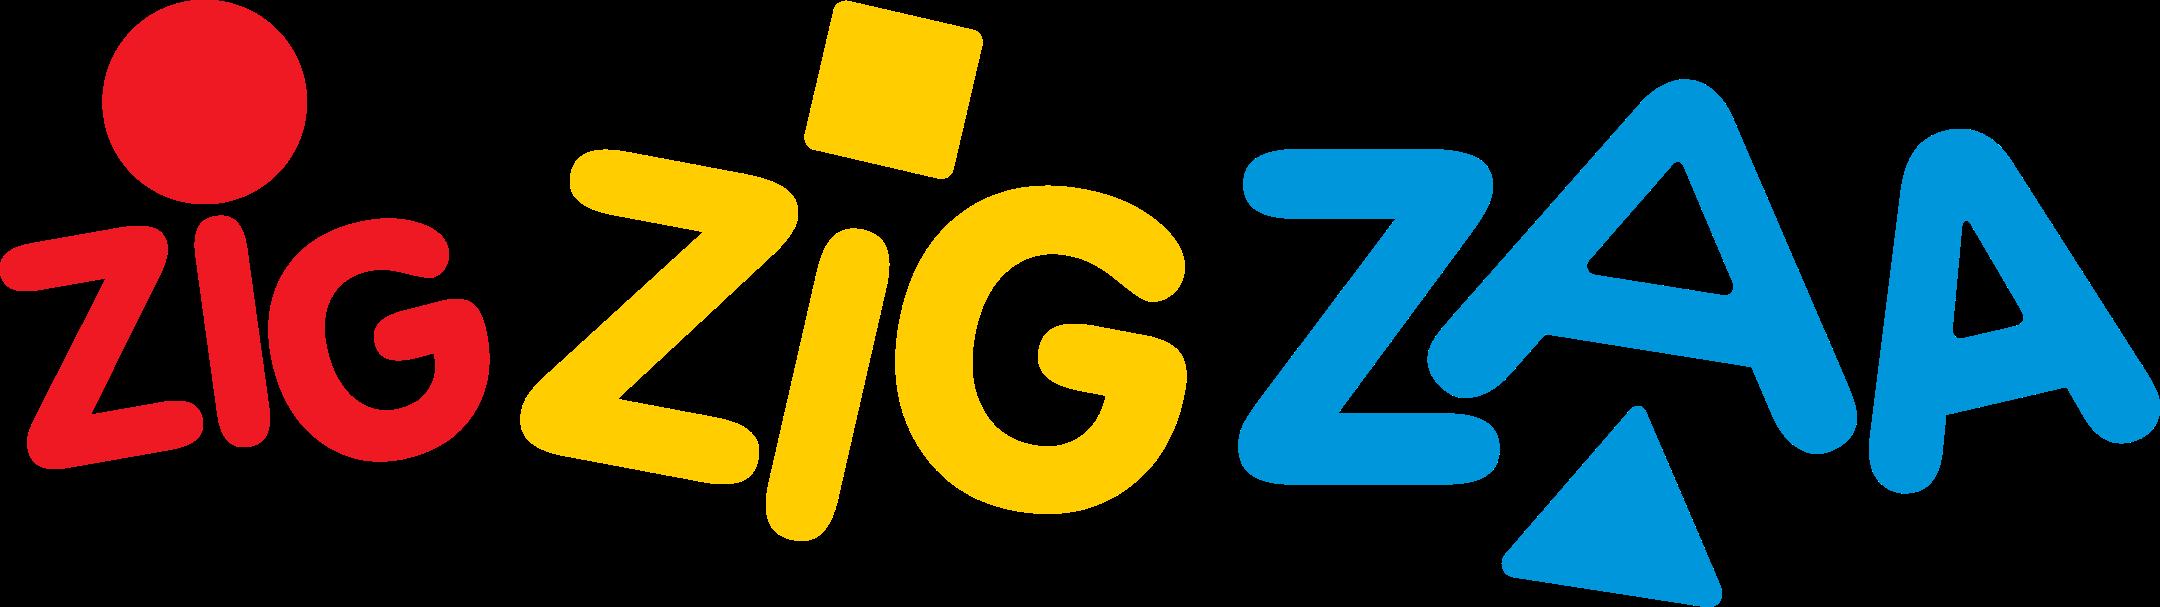 zig zig zaa logo 1 - Zig Zig Zaa Logo